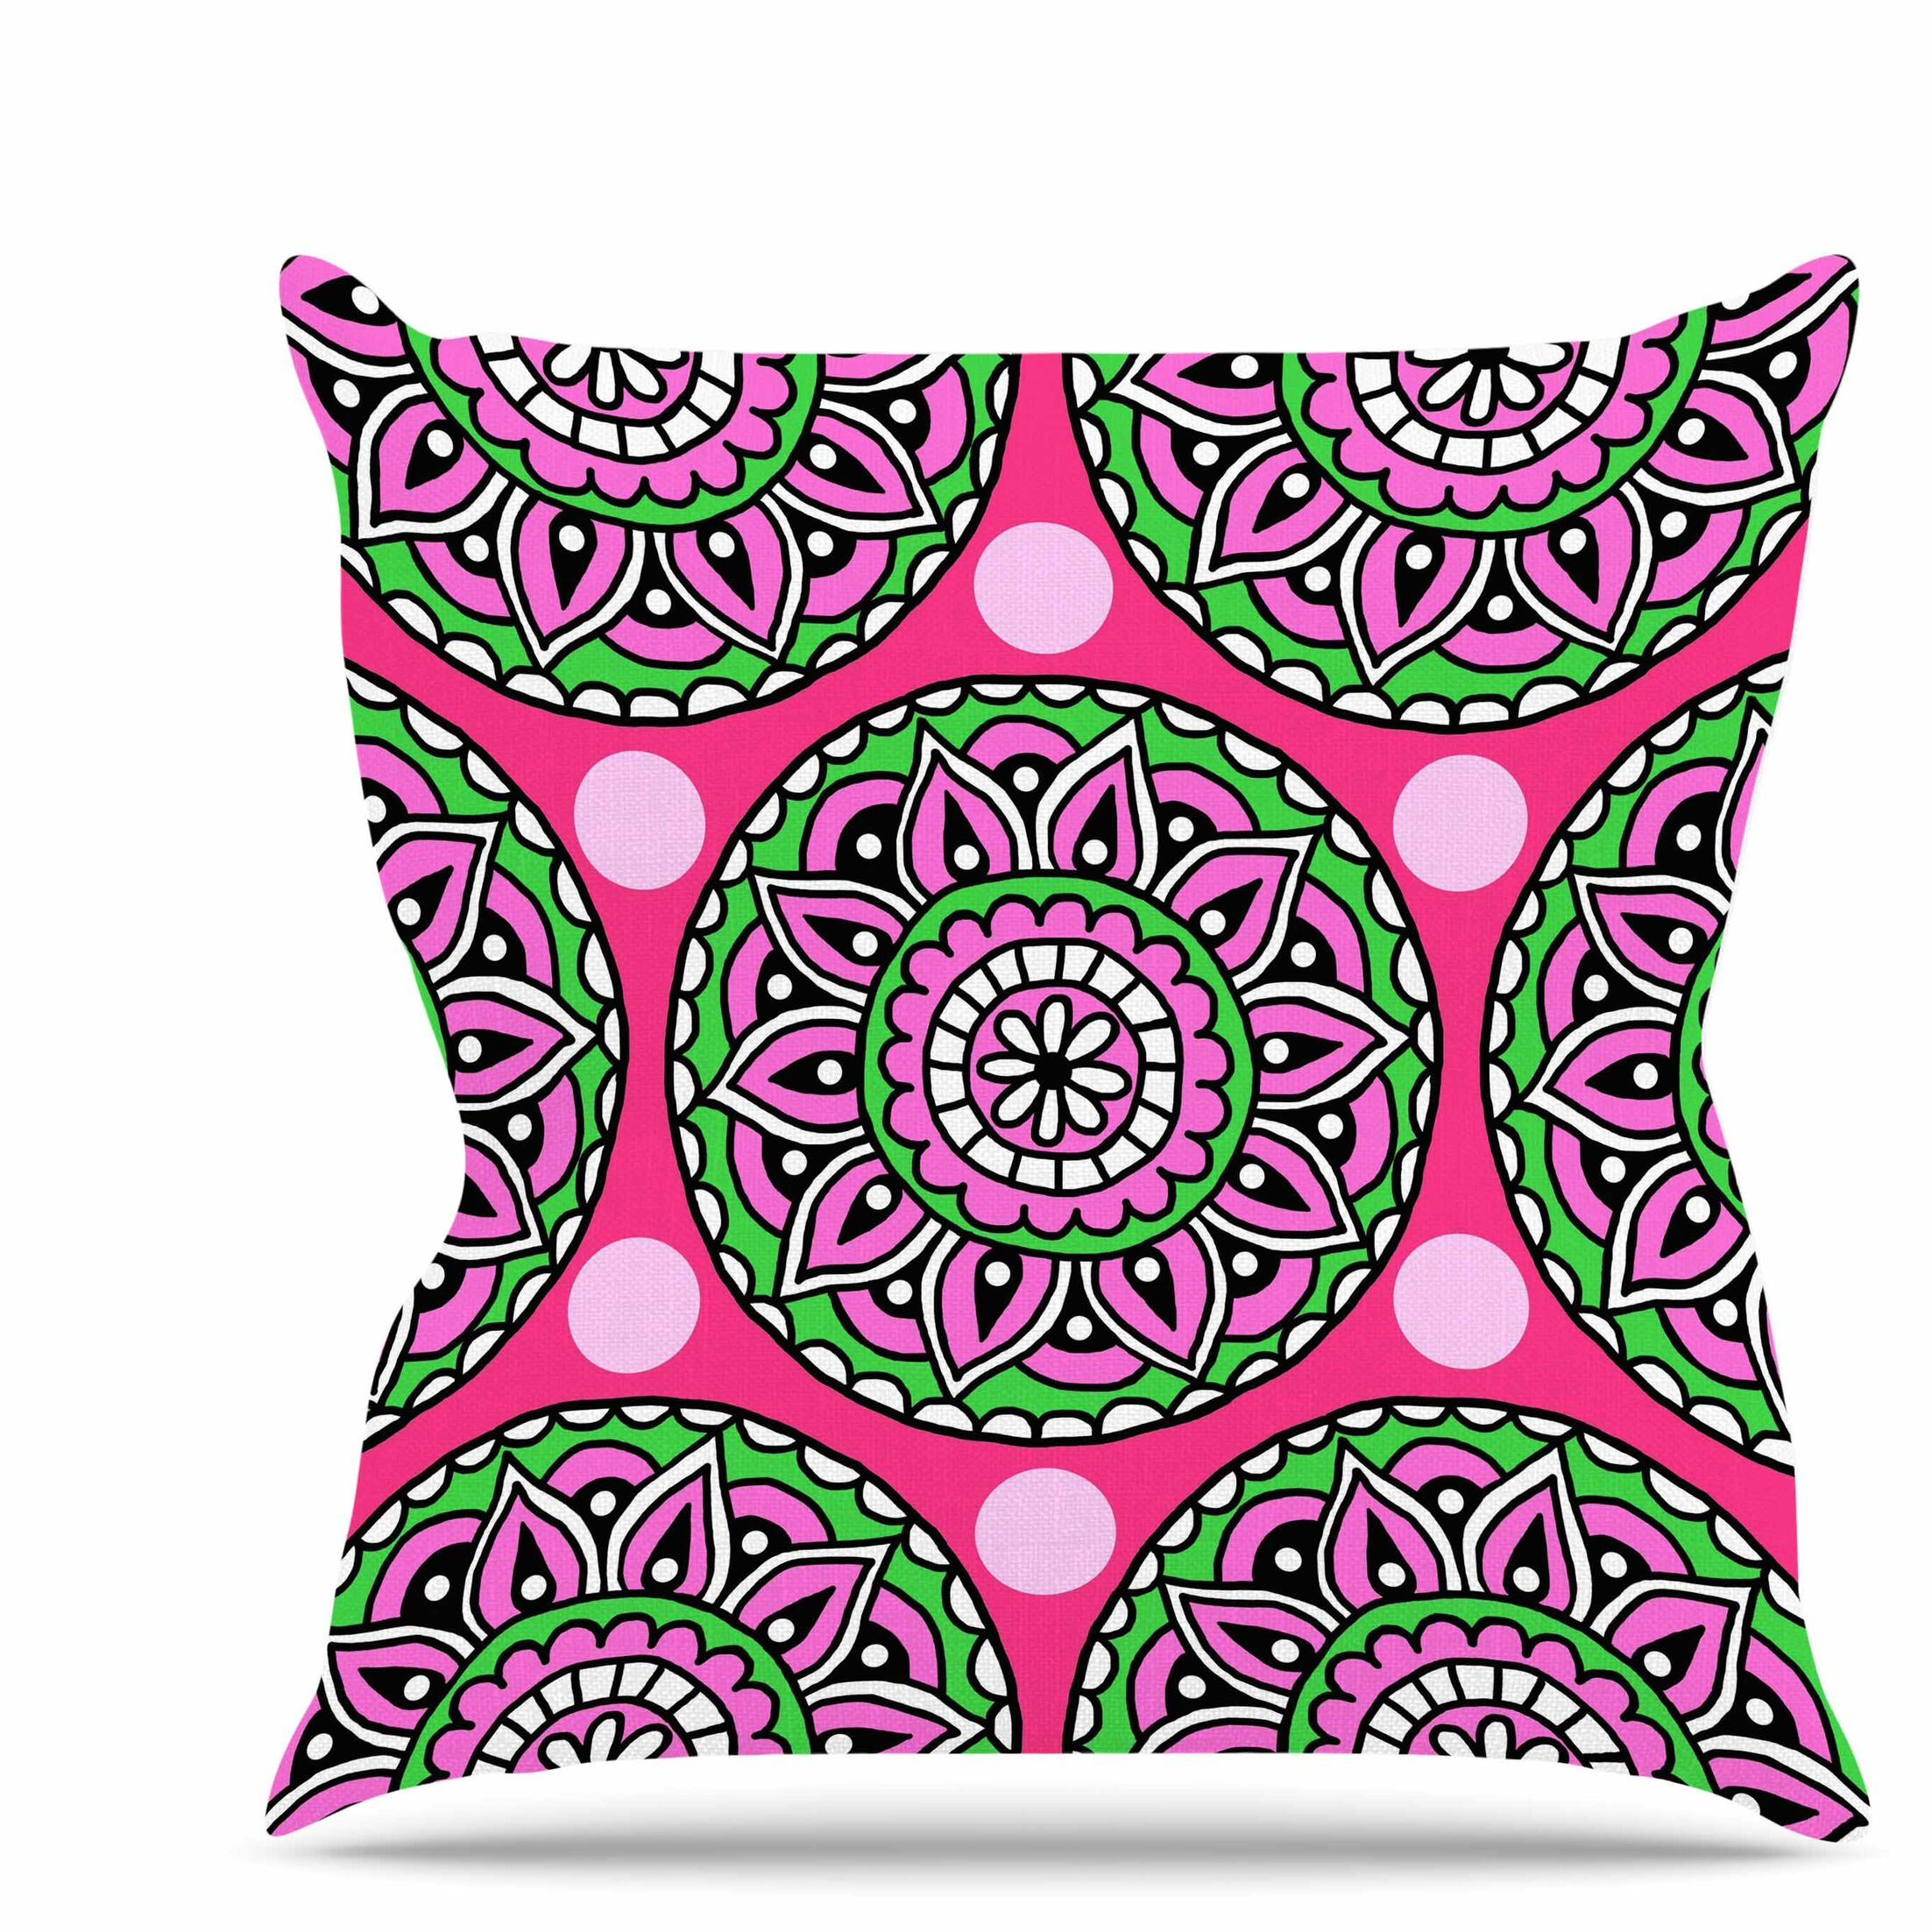 Watermelon Mandala Throw Pillow Size: 26